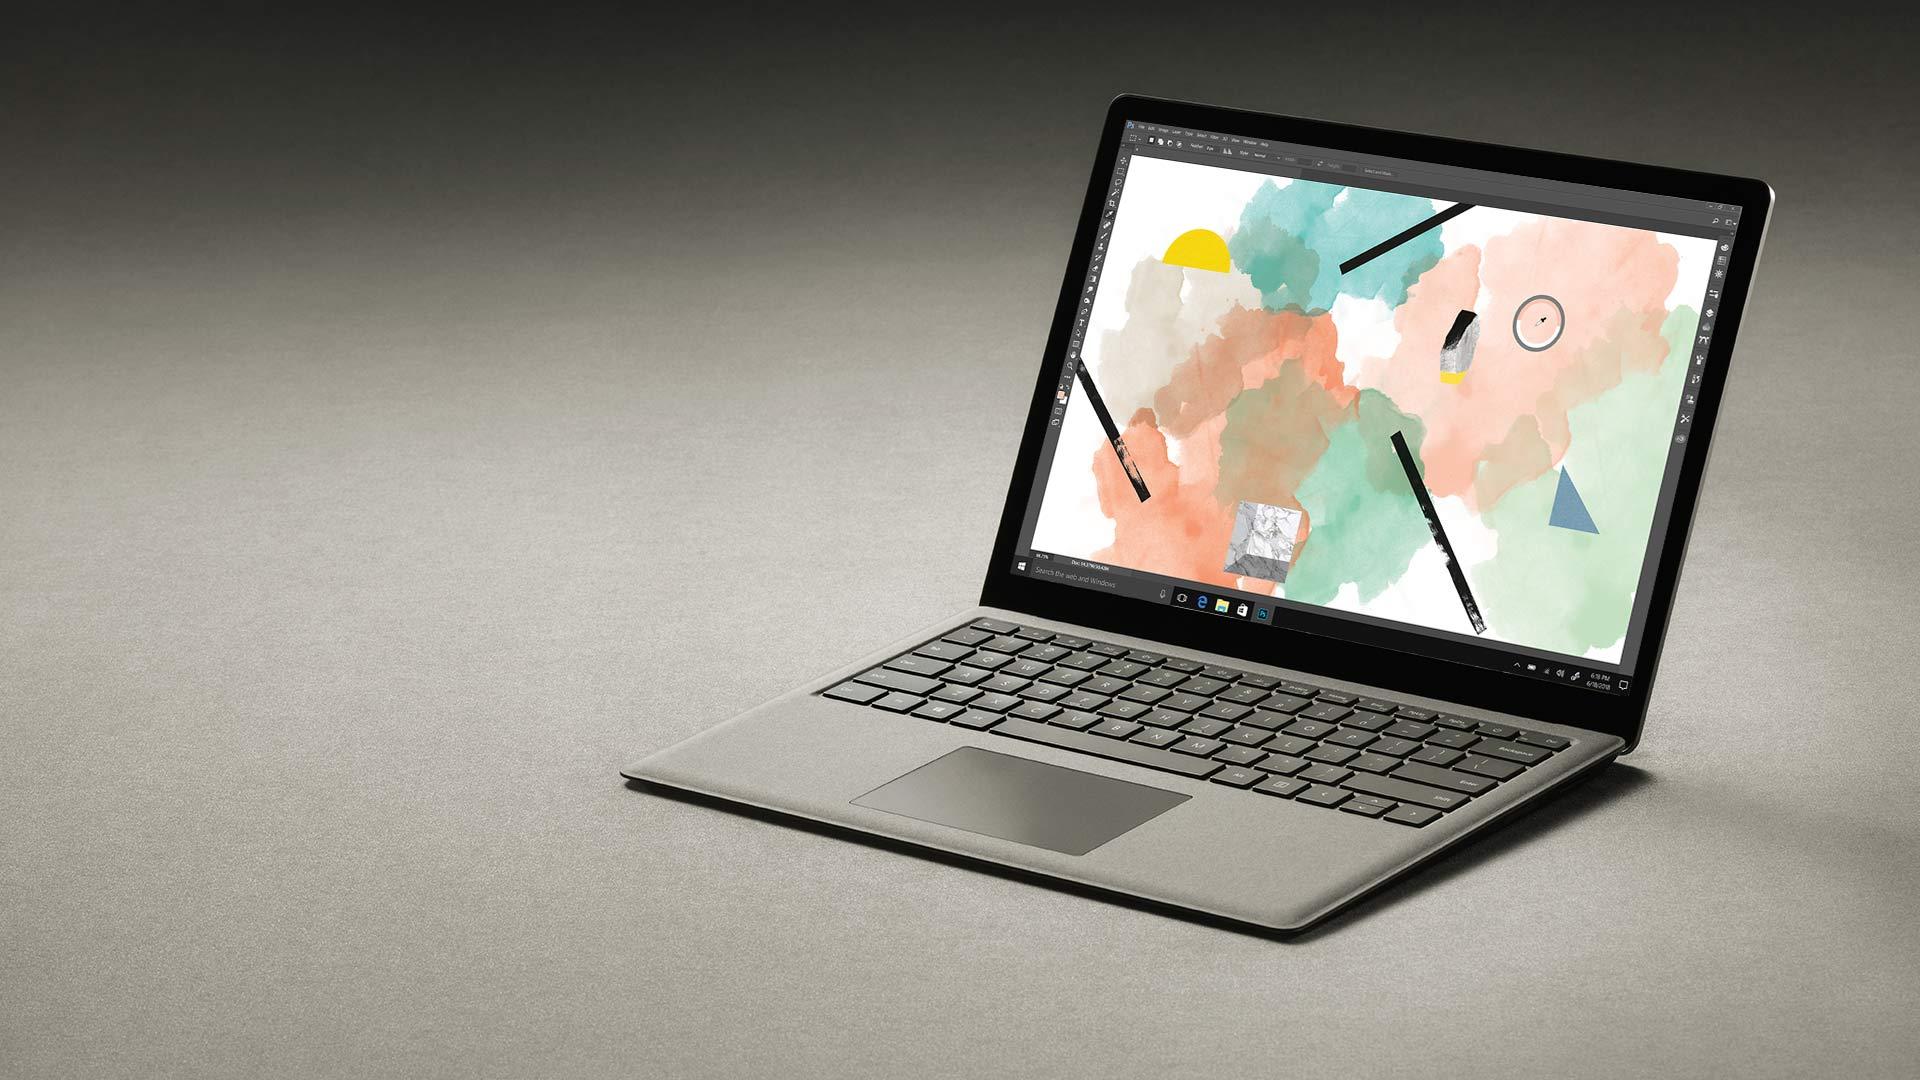 Adobe Photoshop を画面に表示したゴールドの Surface Laptop。